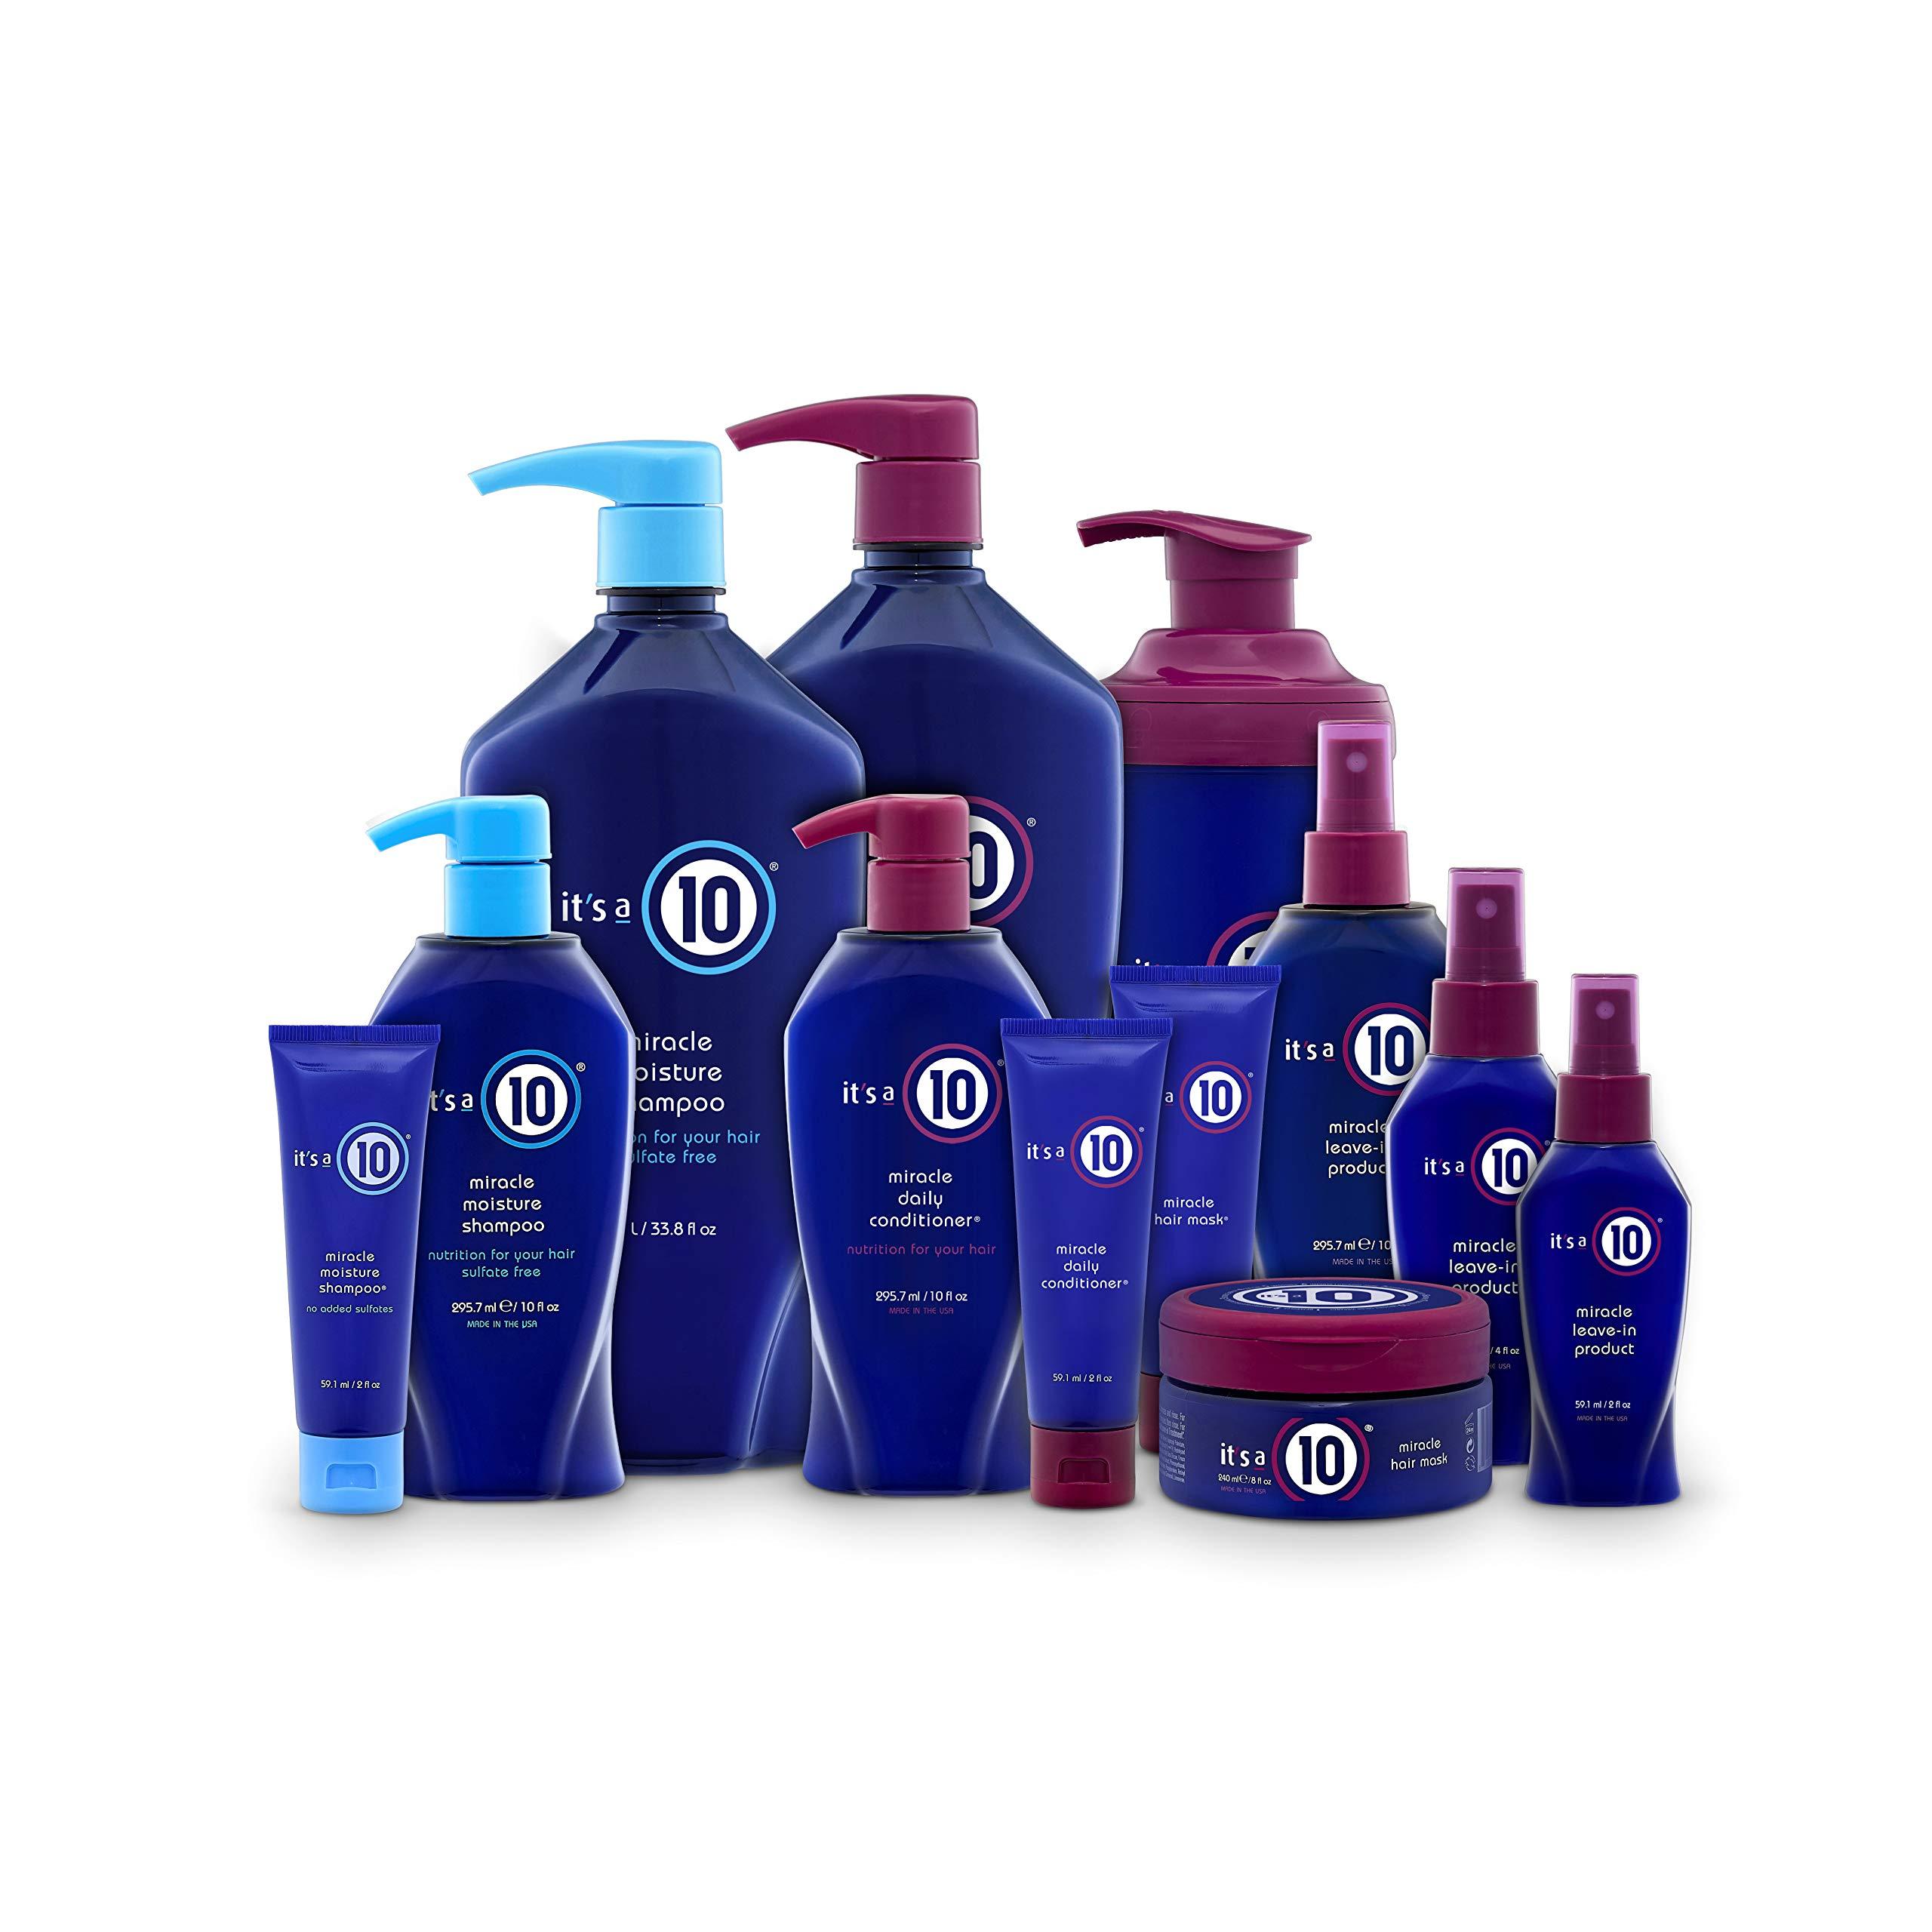 It's a 10 Miracle Moisture Shampoo (33.8 Fl oz)